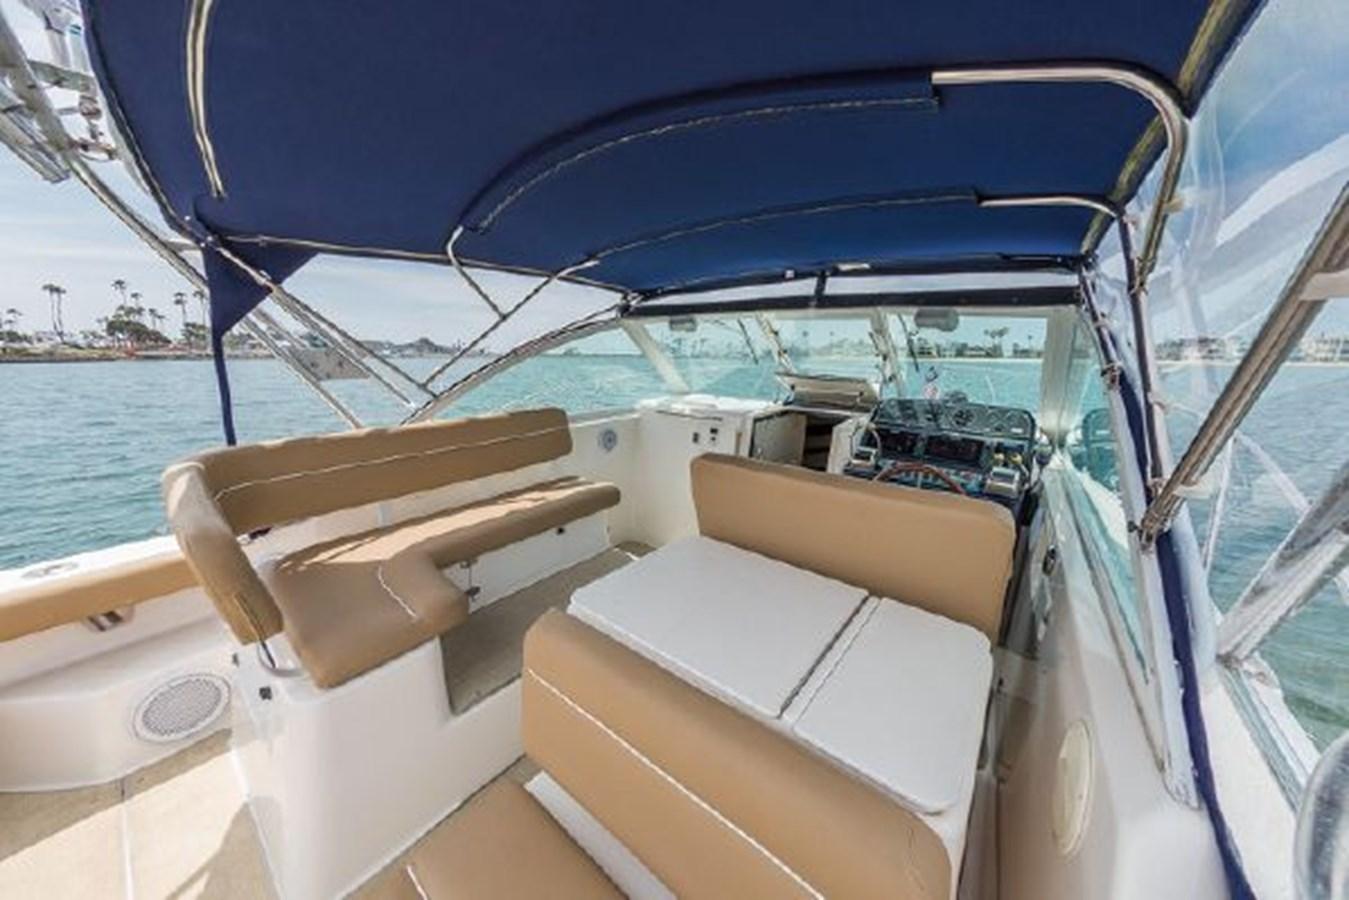 9 2000 TIARA 29 Coronet Sport Fisherman 2705602